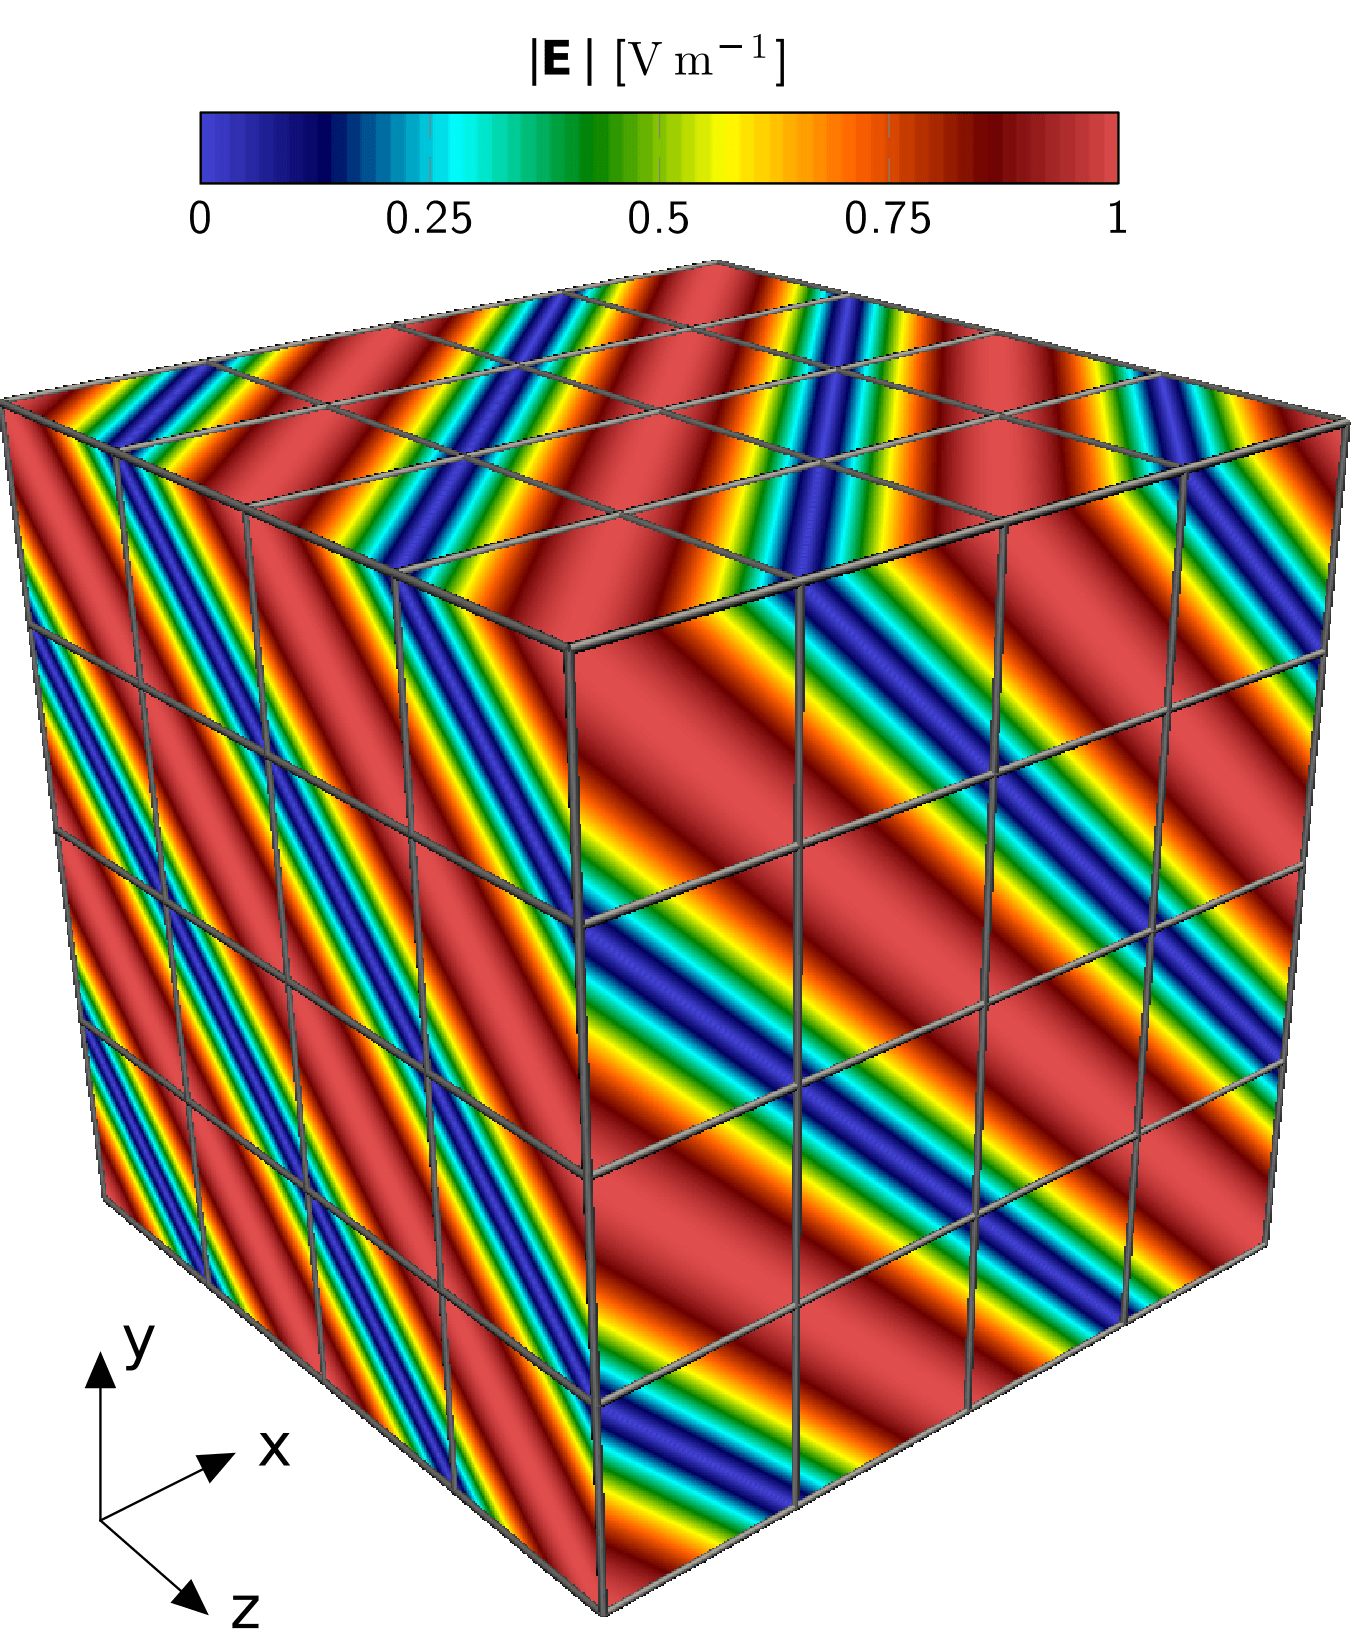 Electromagnetic plane wave propagation